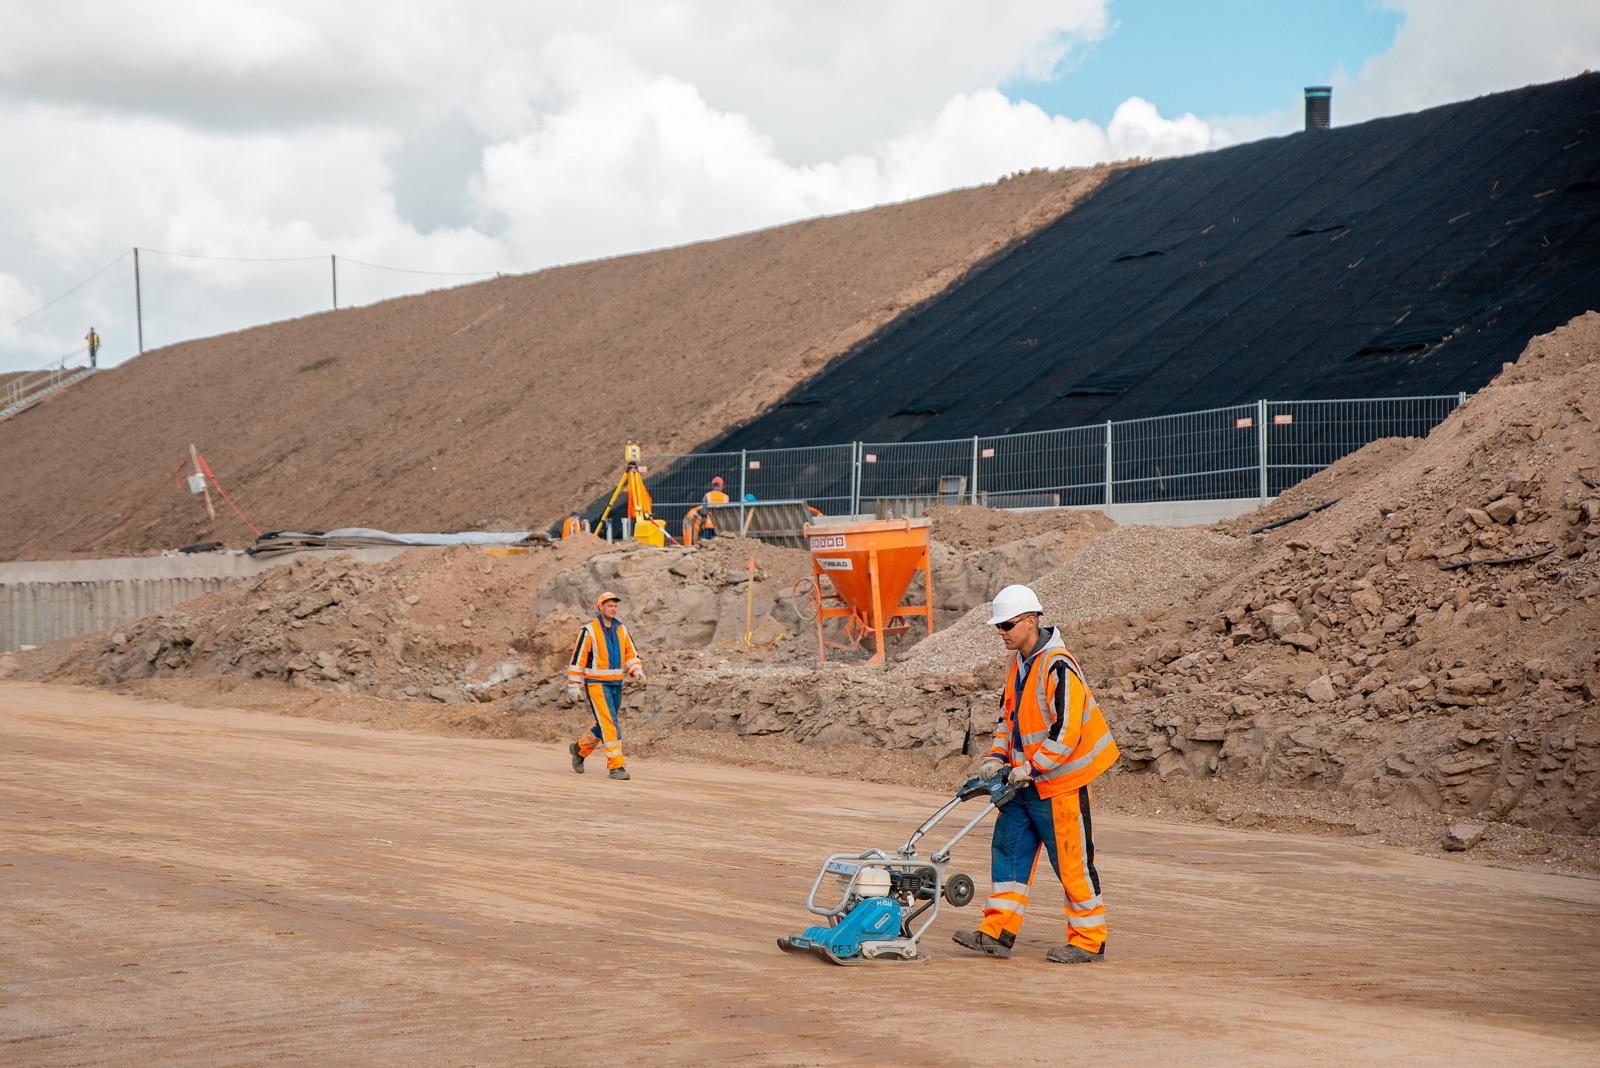 Baigtas pirmasis Islandijos plento Kaune rekonstrukcijos etapas